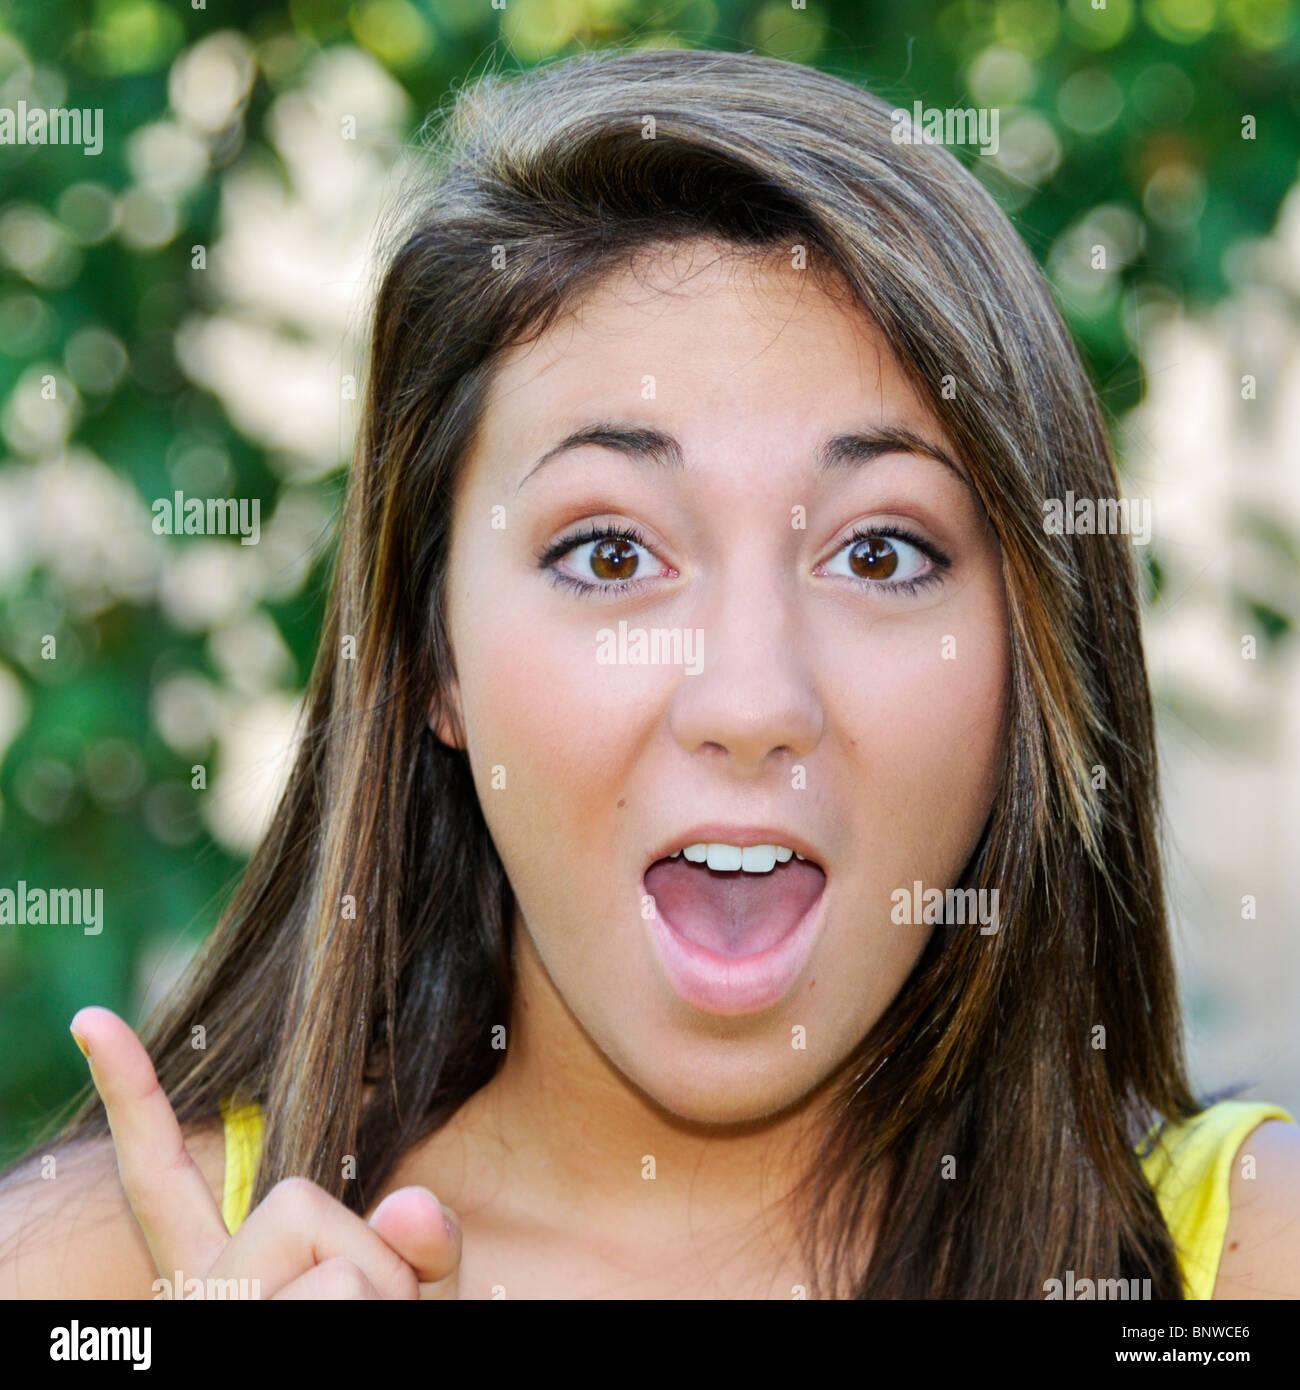 Teen Girl 16 Years Old Stockfotos Teen Girl 16 Years Old Bilder